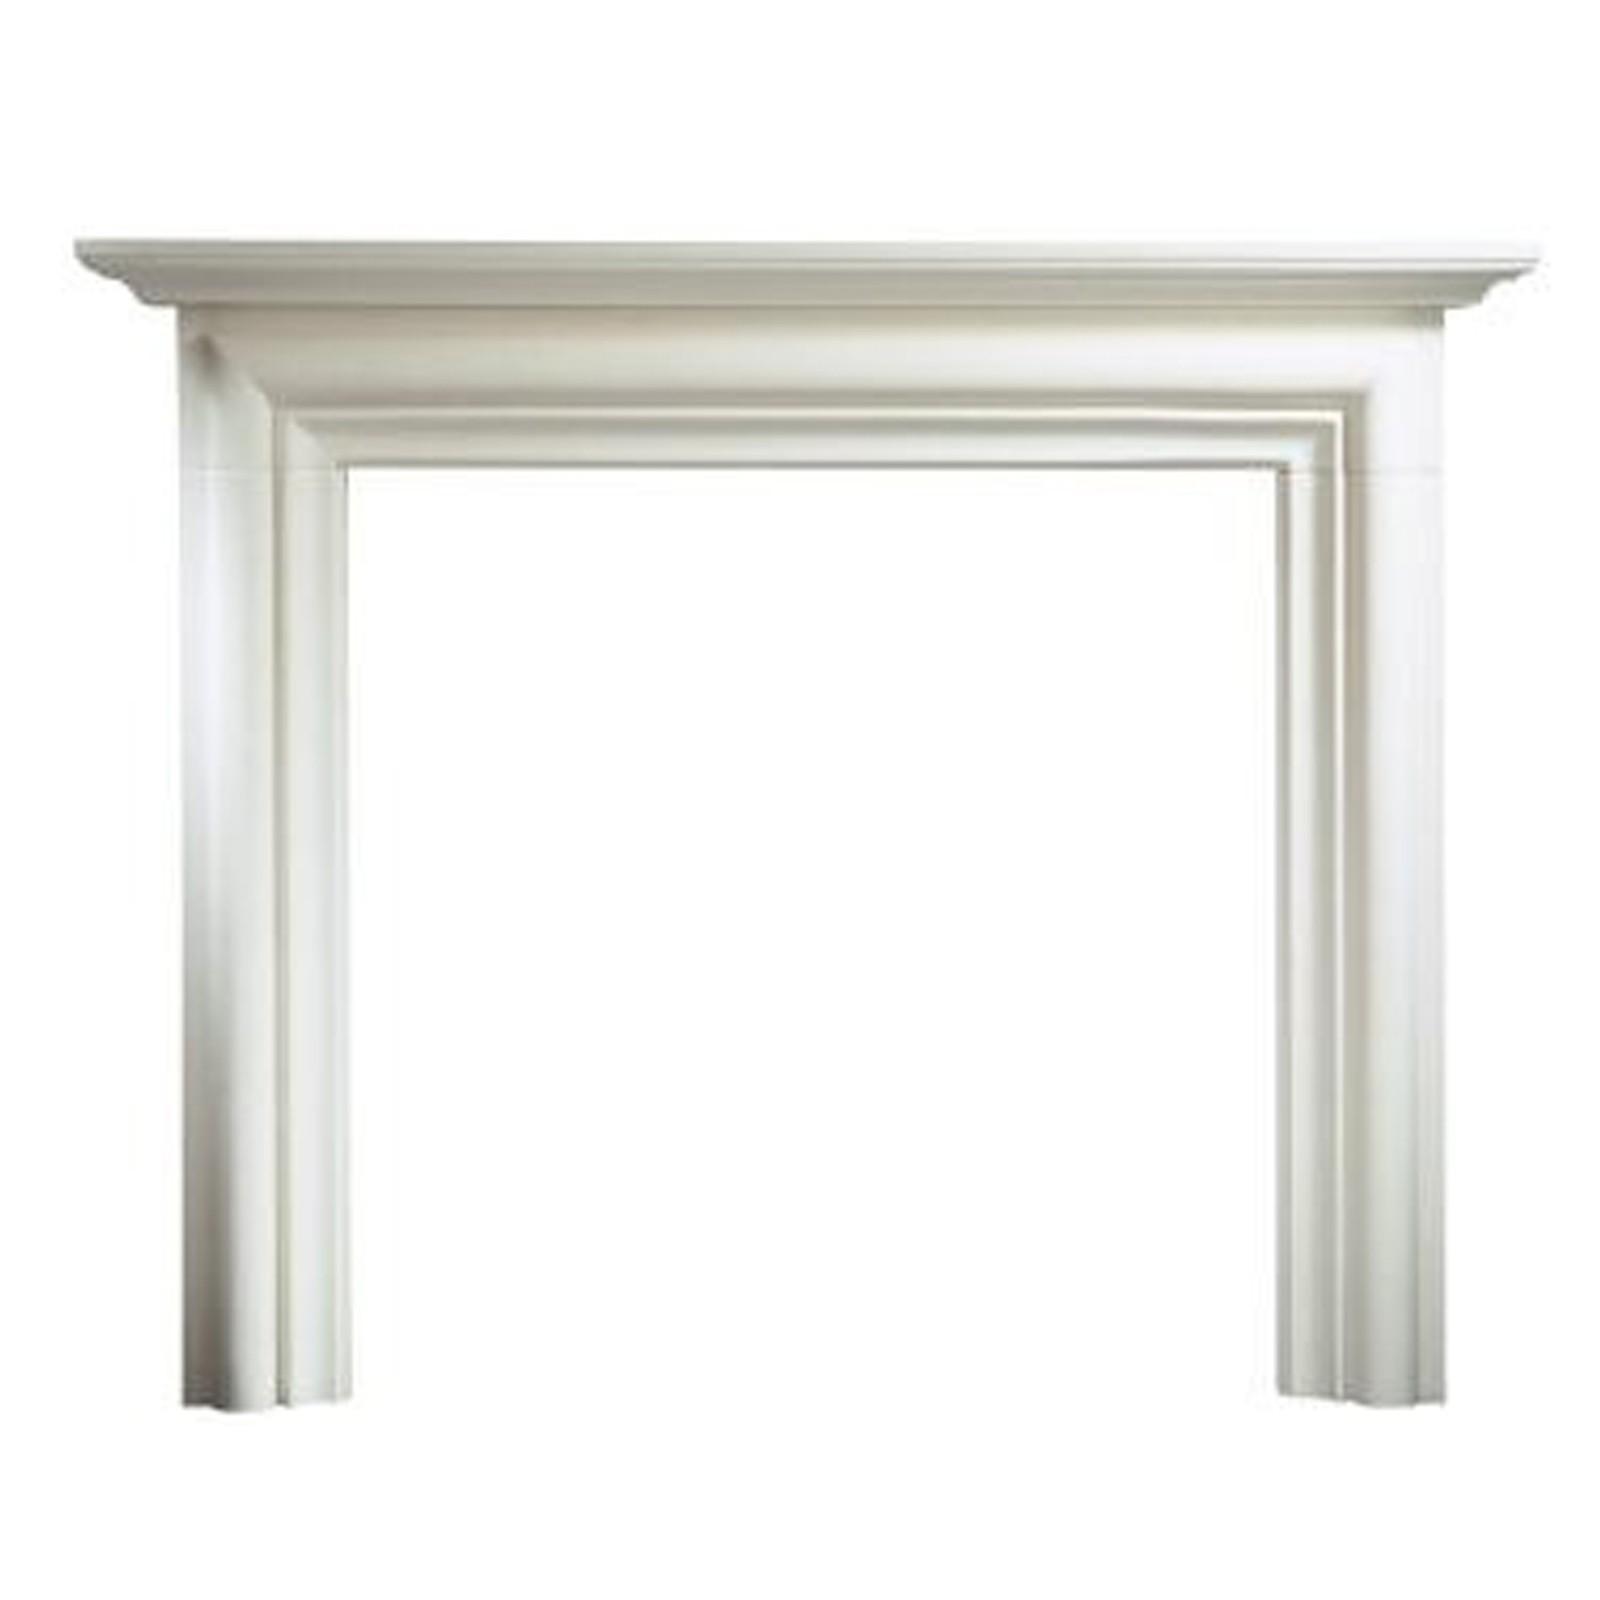 Gallery Modena Limestone 55 Fireplace Surround Mantel Impressive